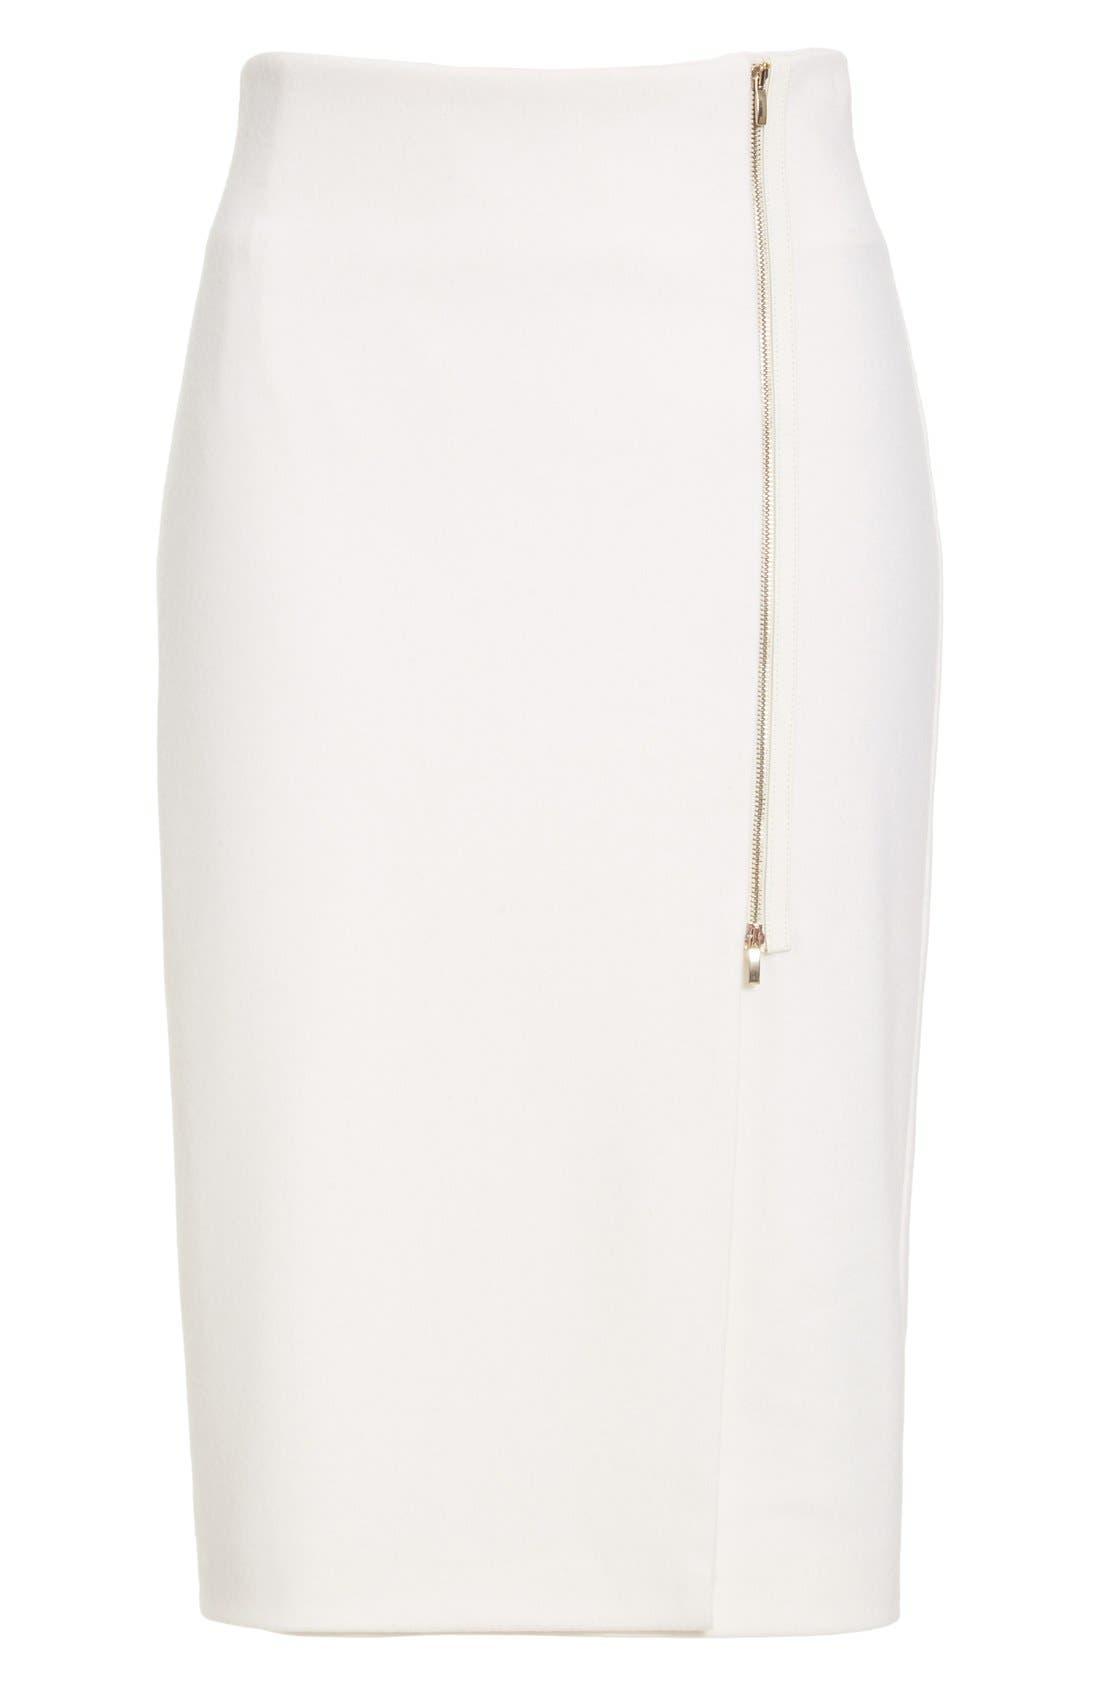 Alternate Image 4  - Max Mara 'Visita' Wool Jersey Pencil Skirt